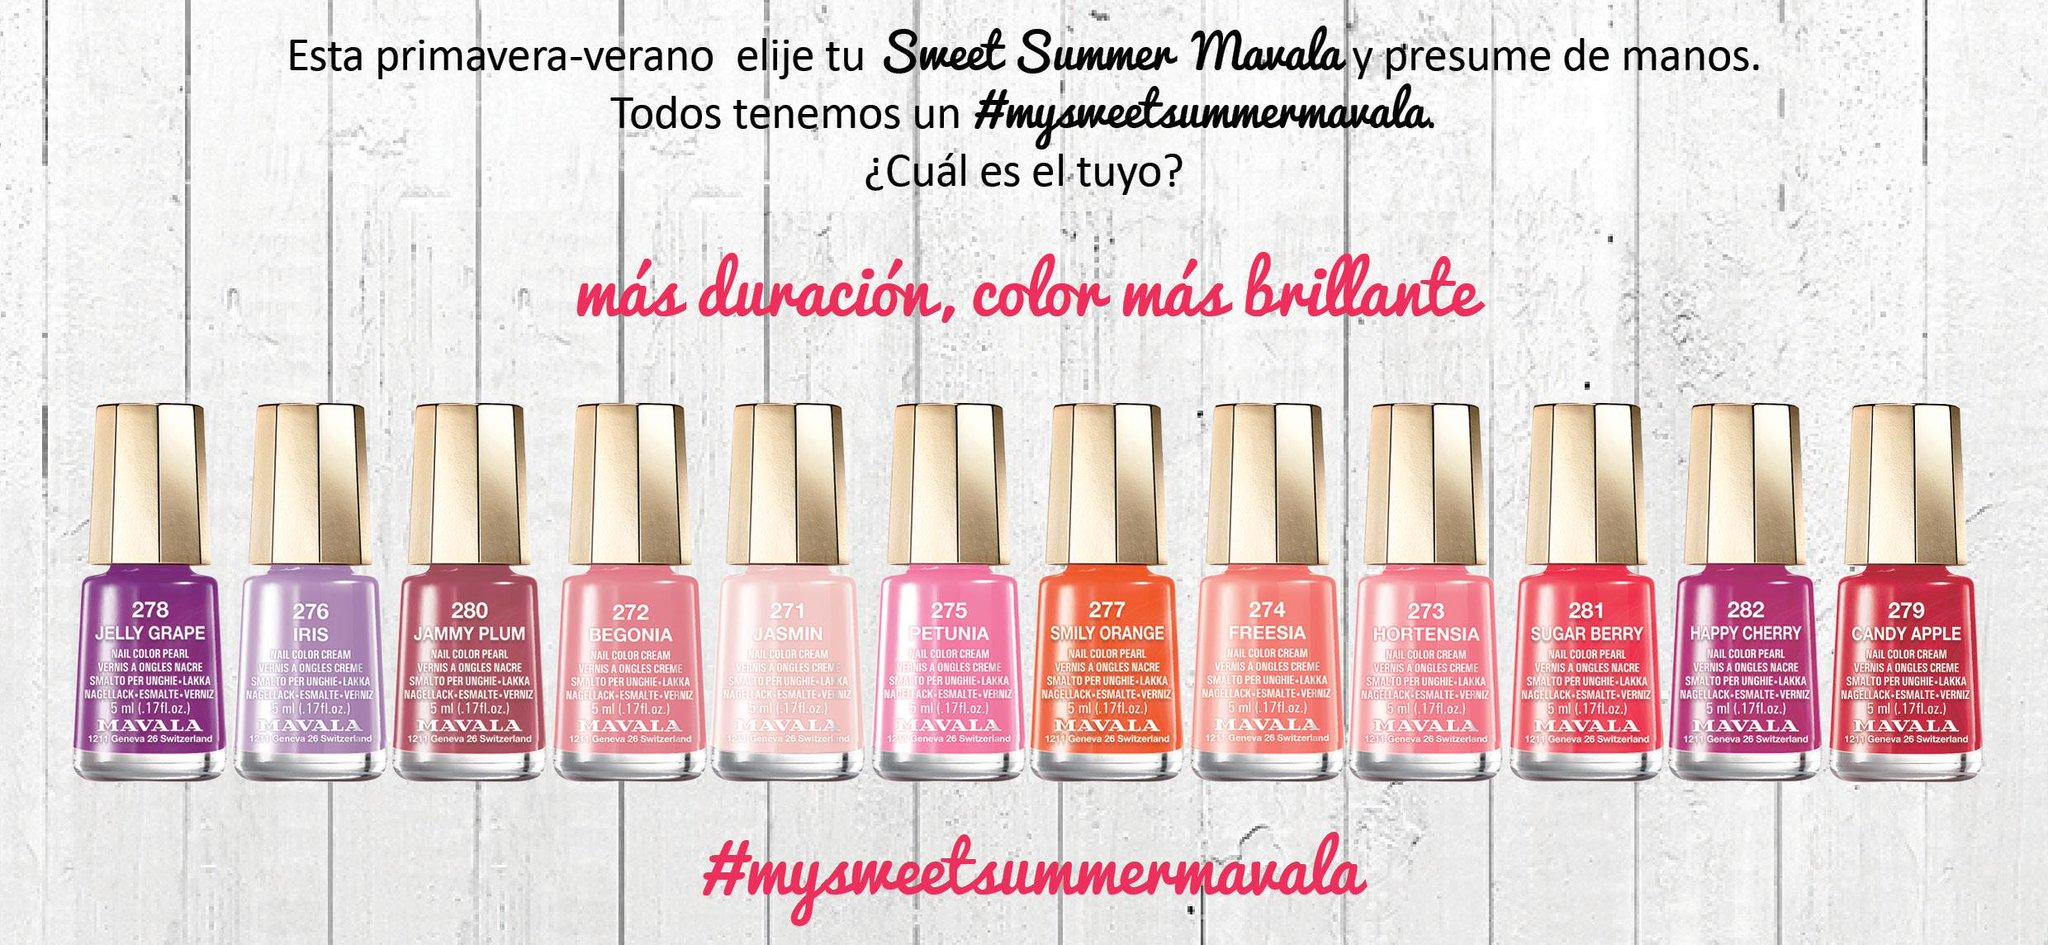 esmalte, manicura, nail art, blog de manicura, blog de belleza, mavala, sweet summer,